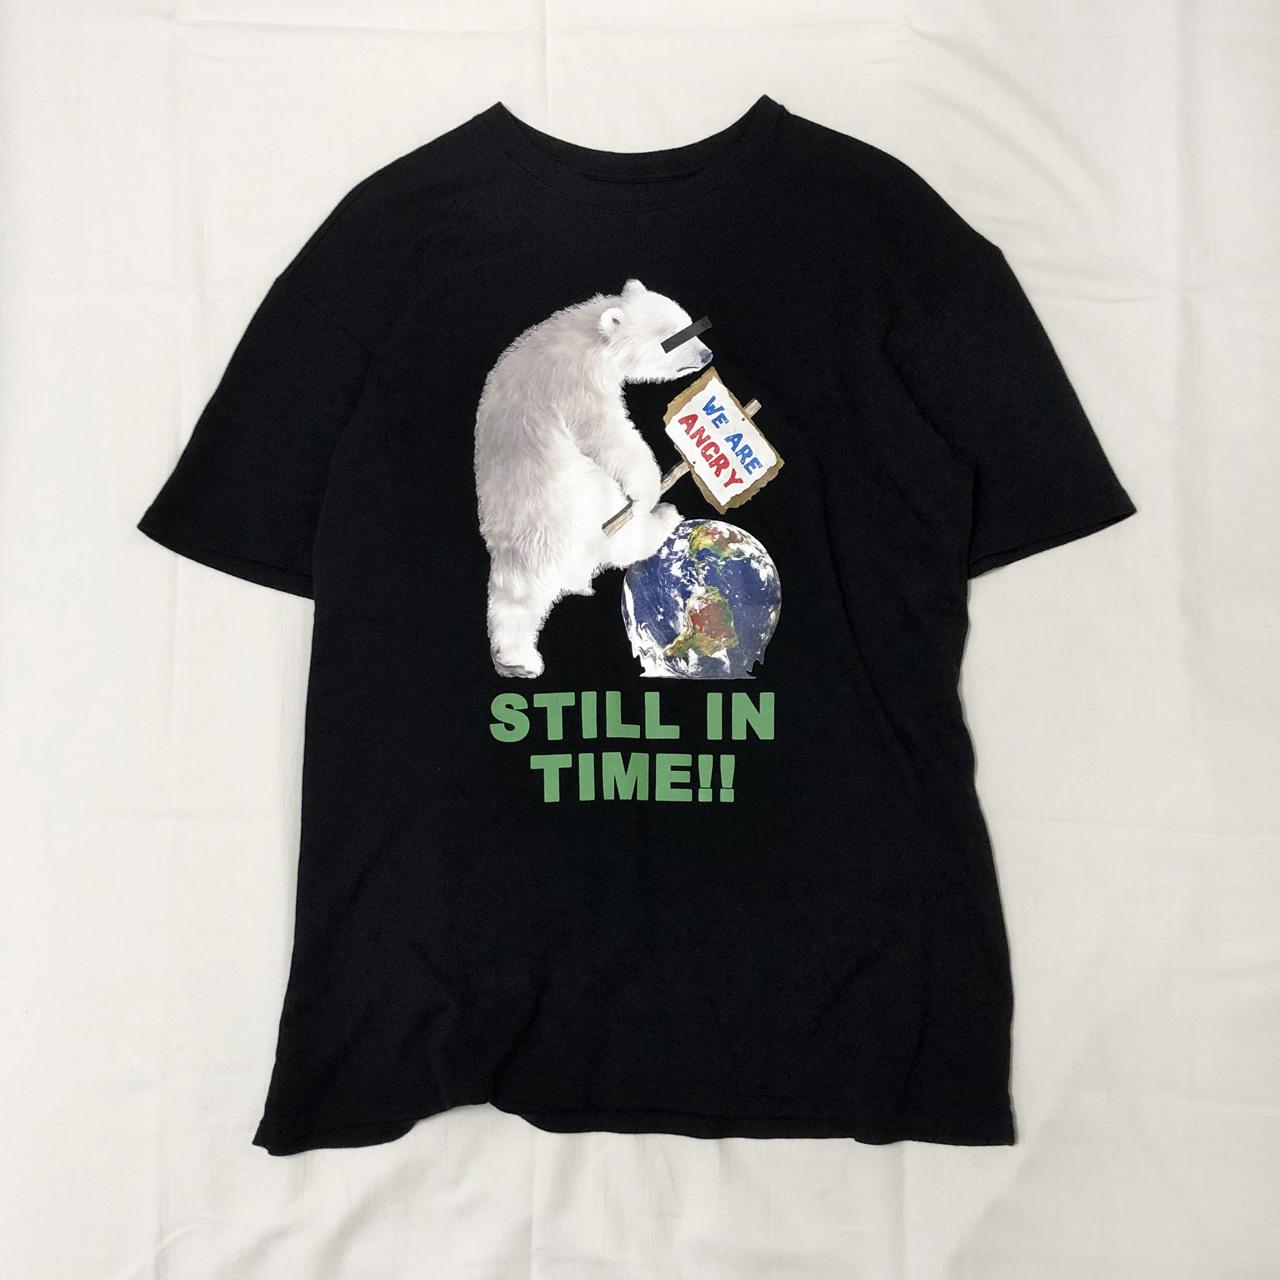 """STILL IN TIME"" ORGANIC COTTON BIG T-SHIRT 【受注生産】"